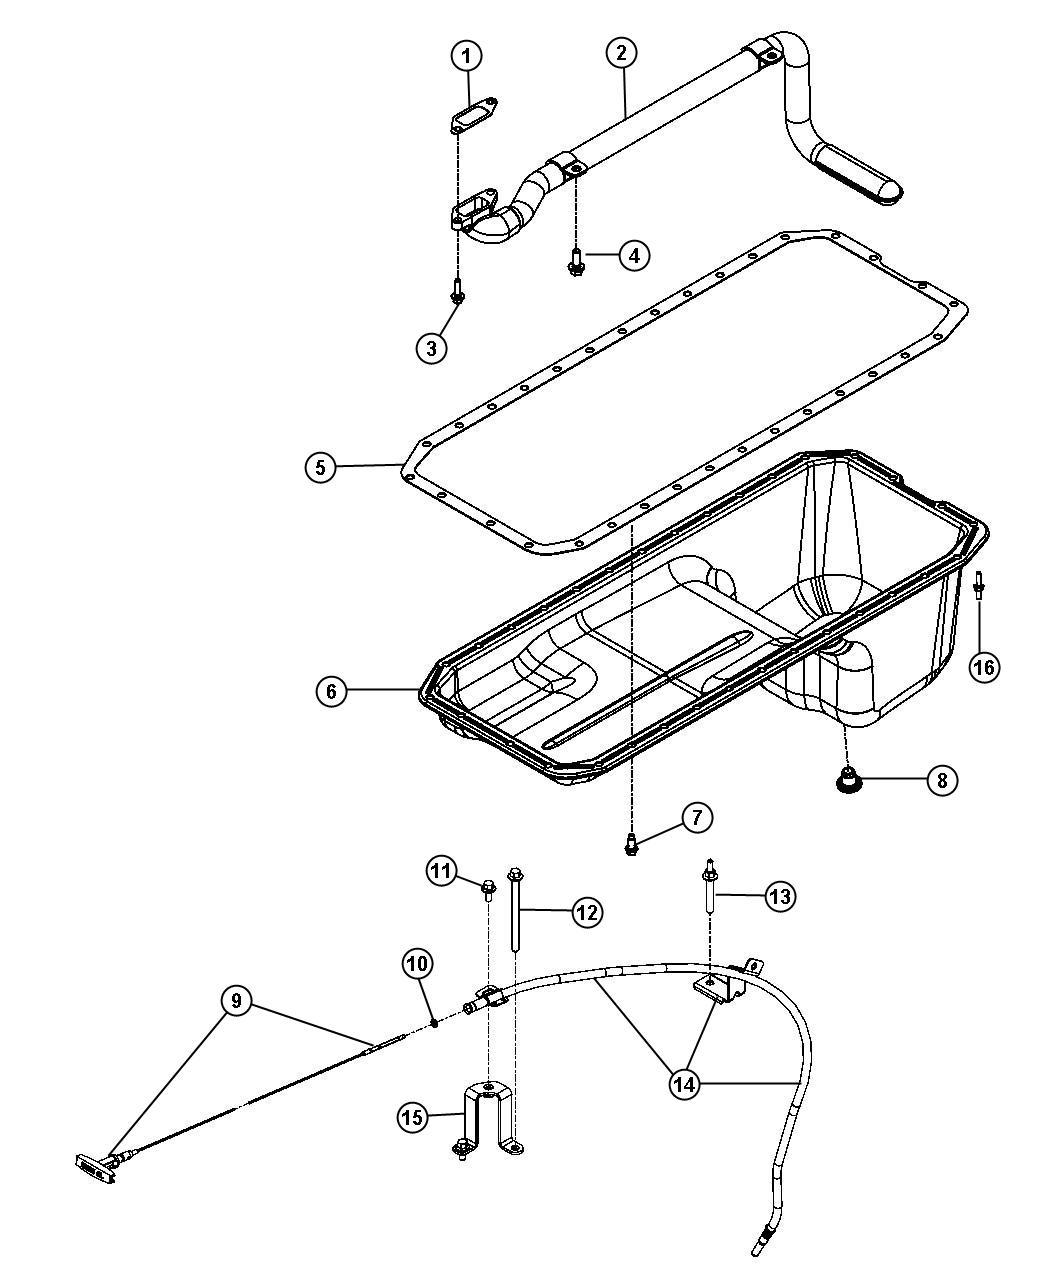 2004 pontiac grand prix fuel injectors wiring diagram database tags 2007 pontiac grand prix 2004 pontiac grand prix gxp 2004 pontiac grand prix engine 1999 pontiac grand prix 1994 pontiac grand prix 2004 pontiac grand